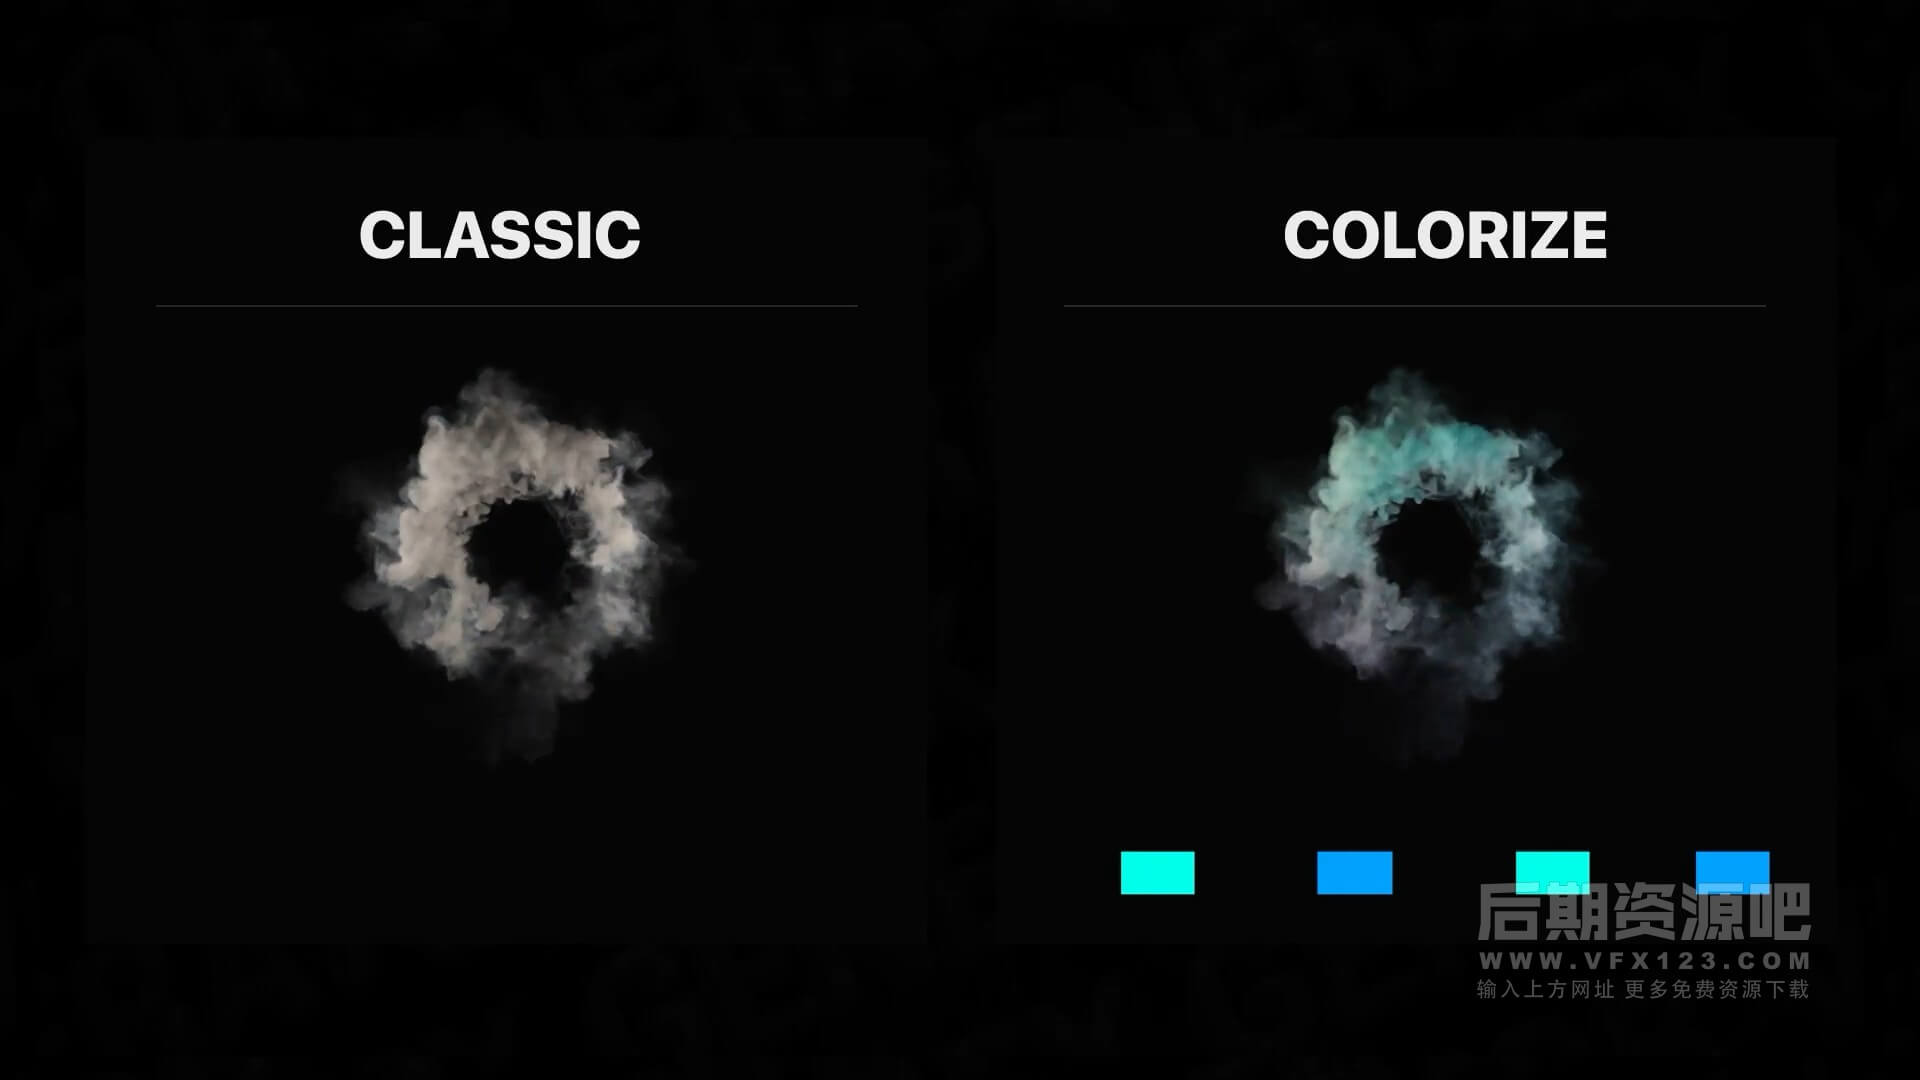 fcpx插件 仿真模拟烟雾火焰特效动画元素 Smoke And Fire VFX Simulation